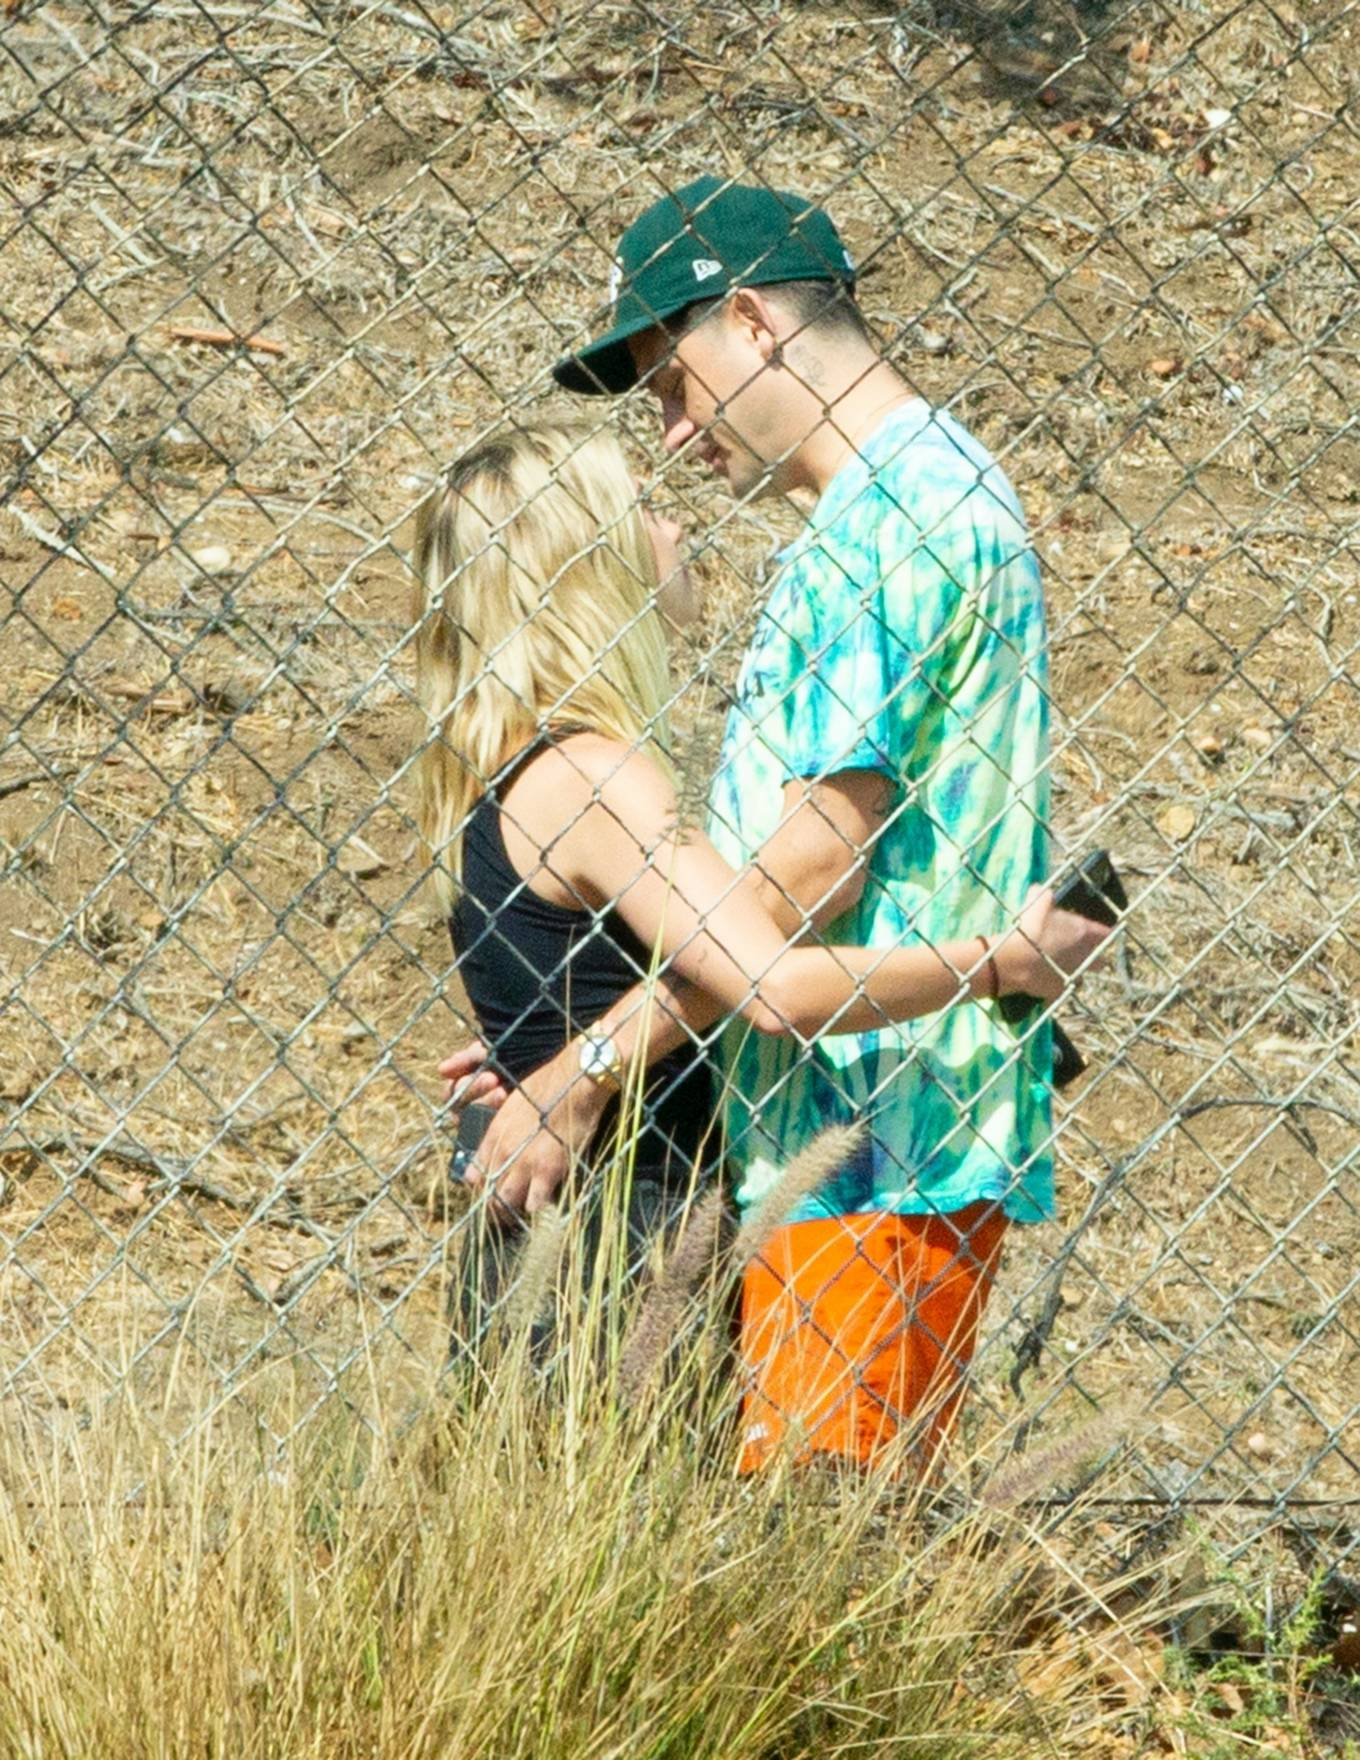 Ashley Benson 2020 : Ashley Benson and boyfriend G-Eazy as she arrives at his video shoot in Malibu-04